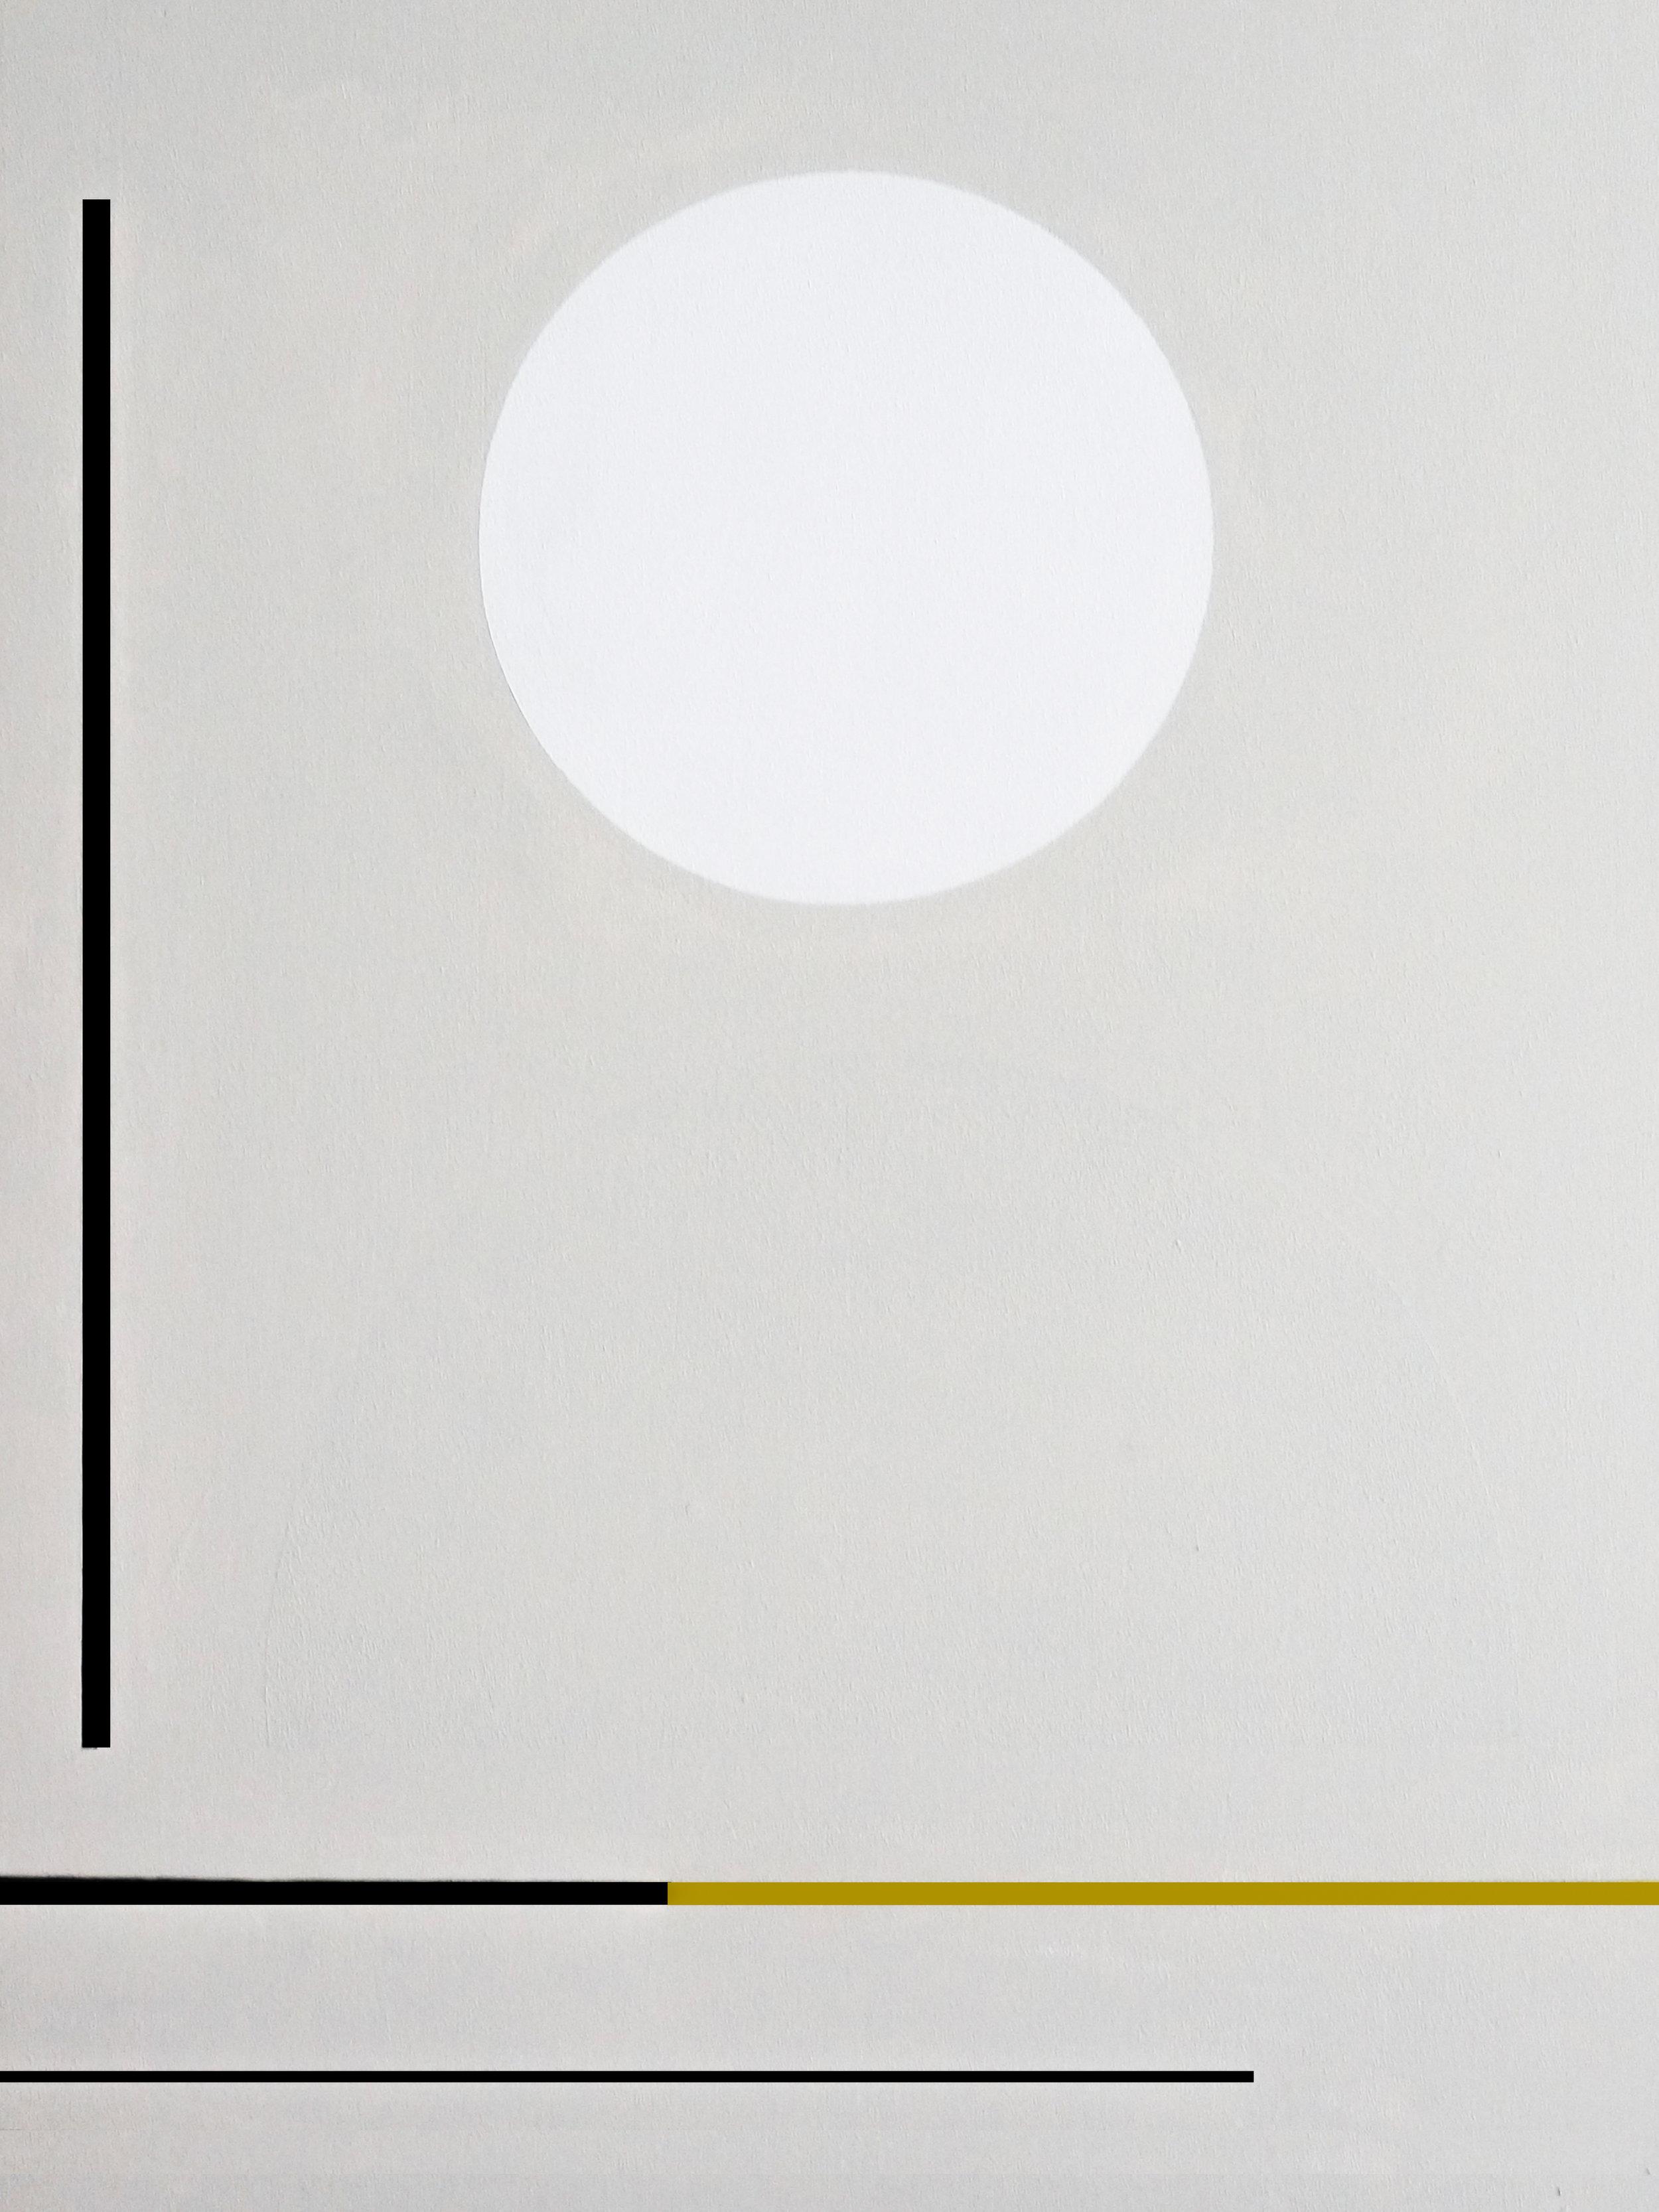 Jaclyn Mottola - _When the HIgh Wore Off_ - 24x18_- Acrylic on Wood Panel- 2018-$350..jpg